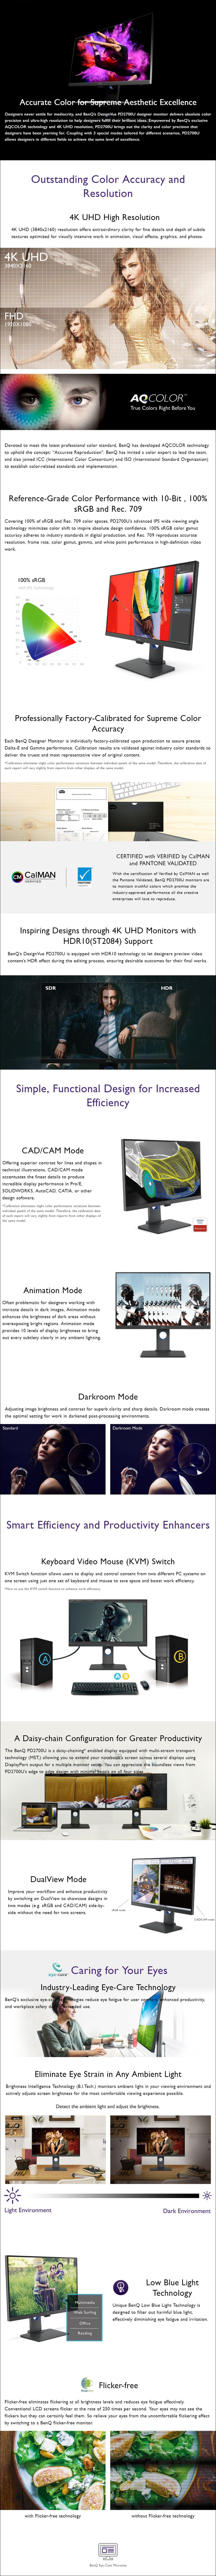 "BenQ PD2700U 27"" 4K UHD 100% sRGB HDR10 Calibrated IPS Designer Monitor - Overview 1"